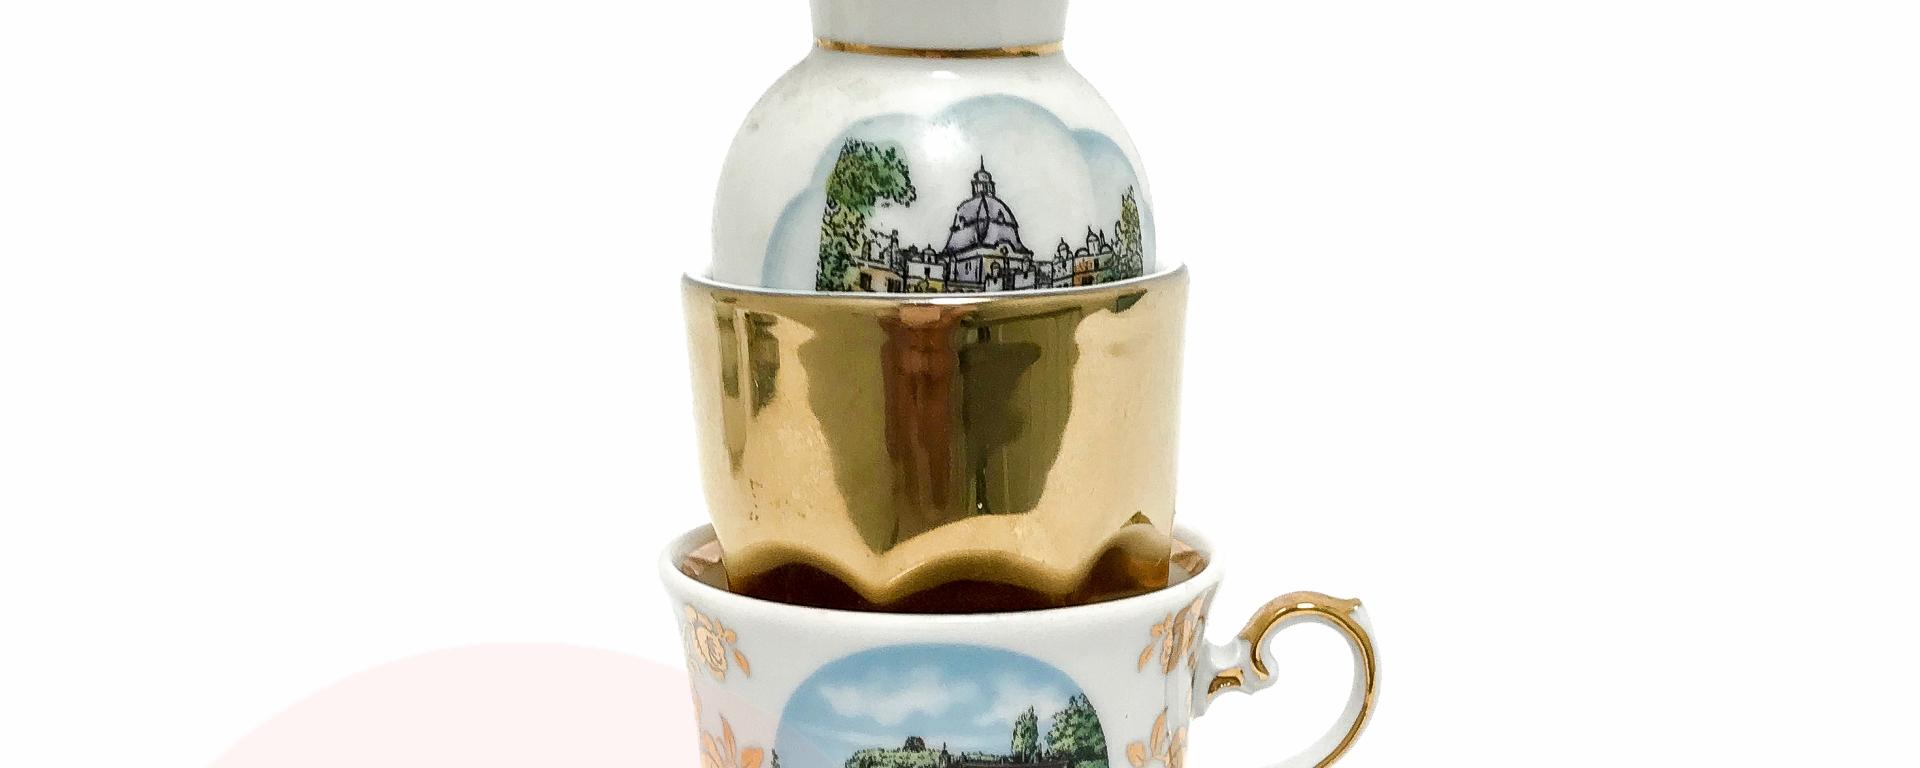 glitzy german souvenir set